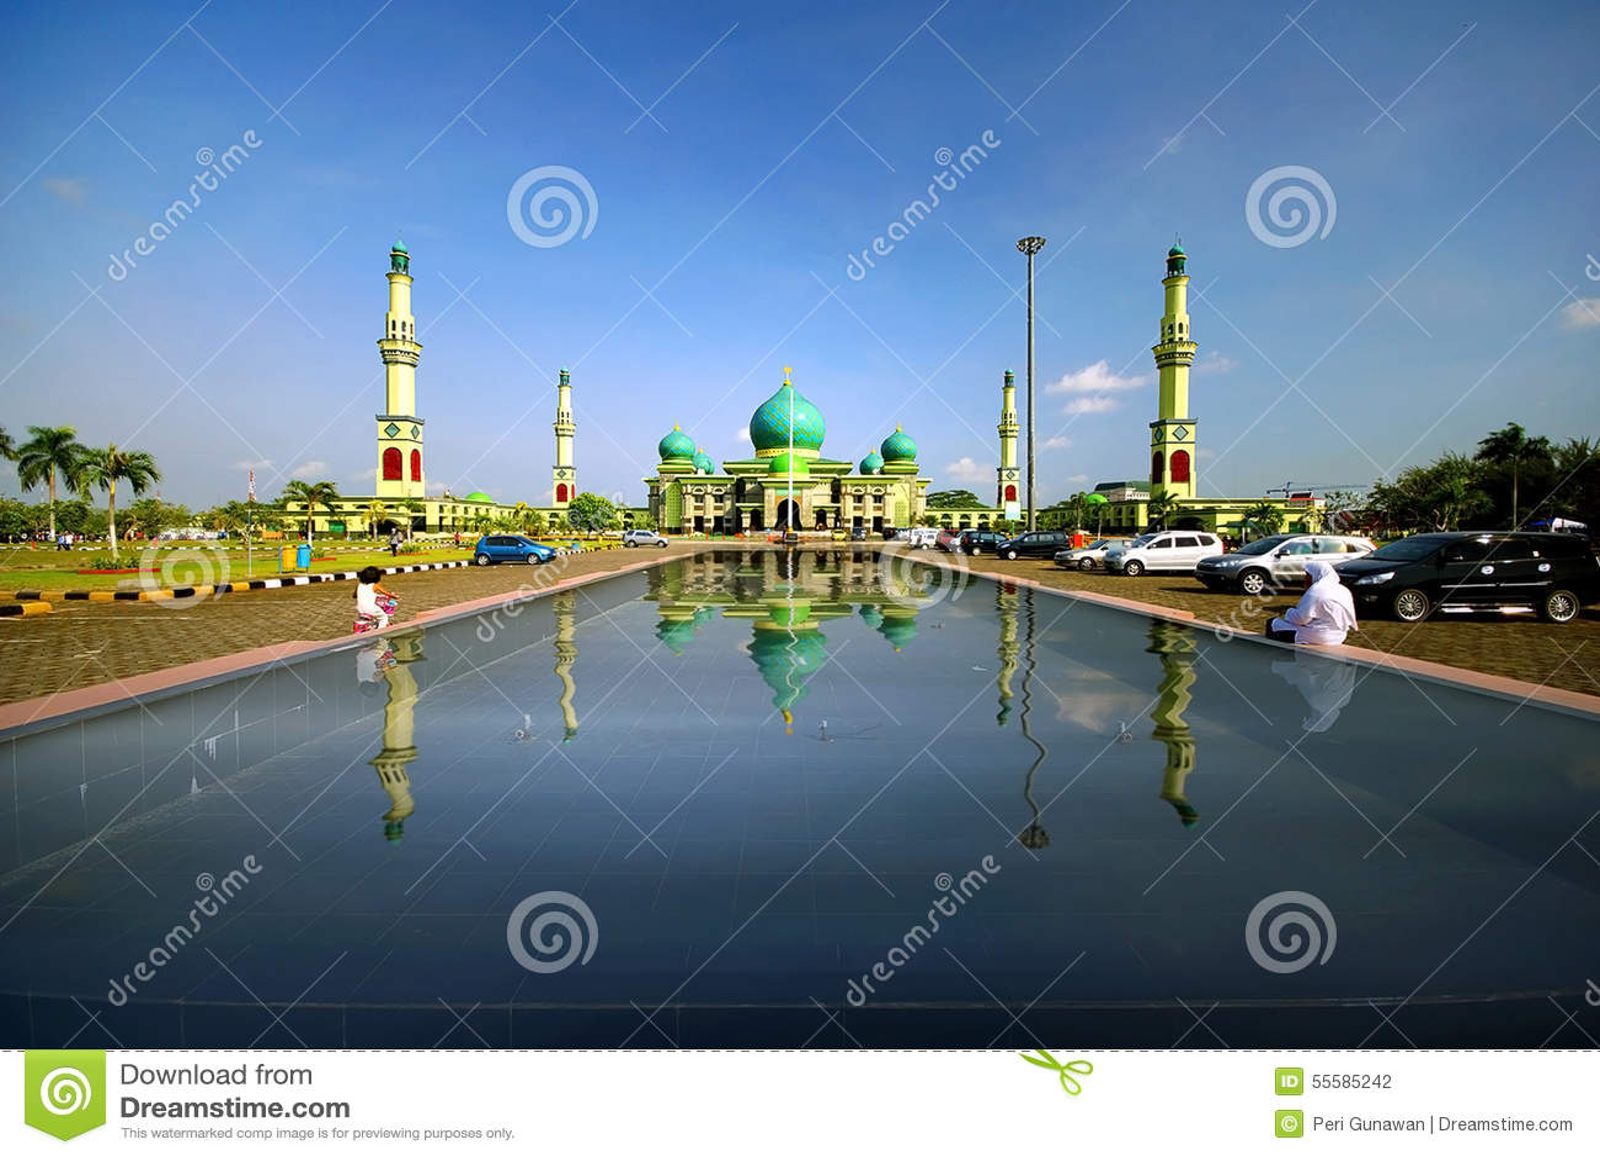 Masjid Annur Pekanbaru